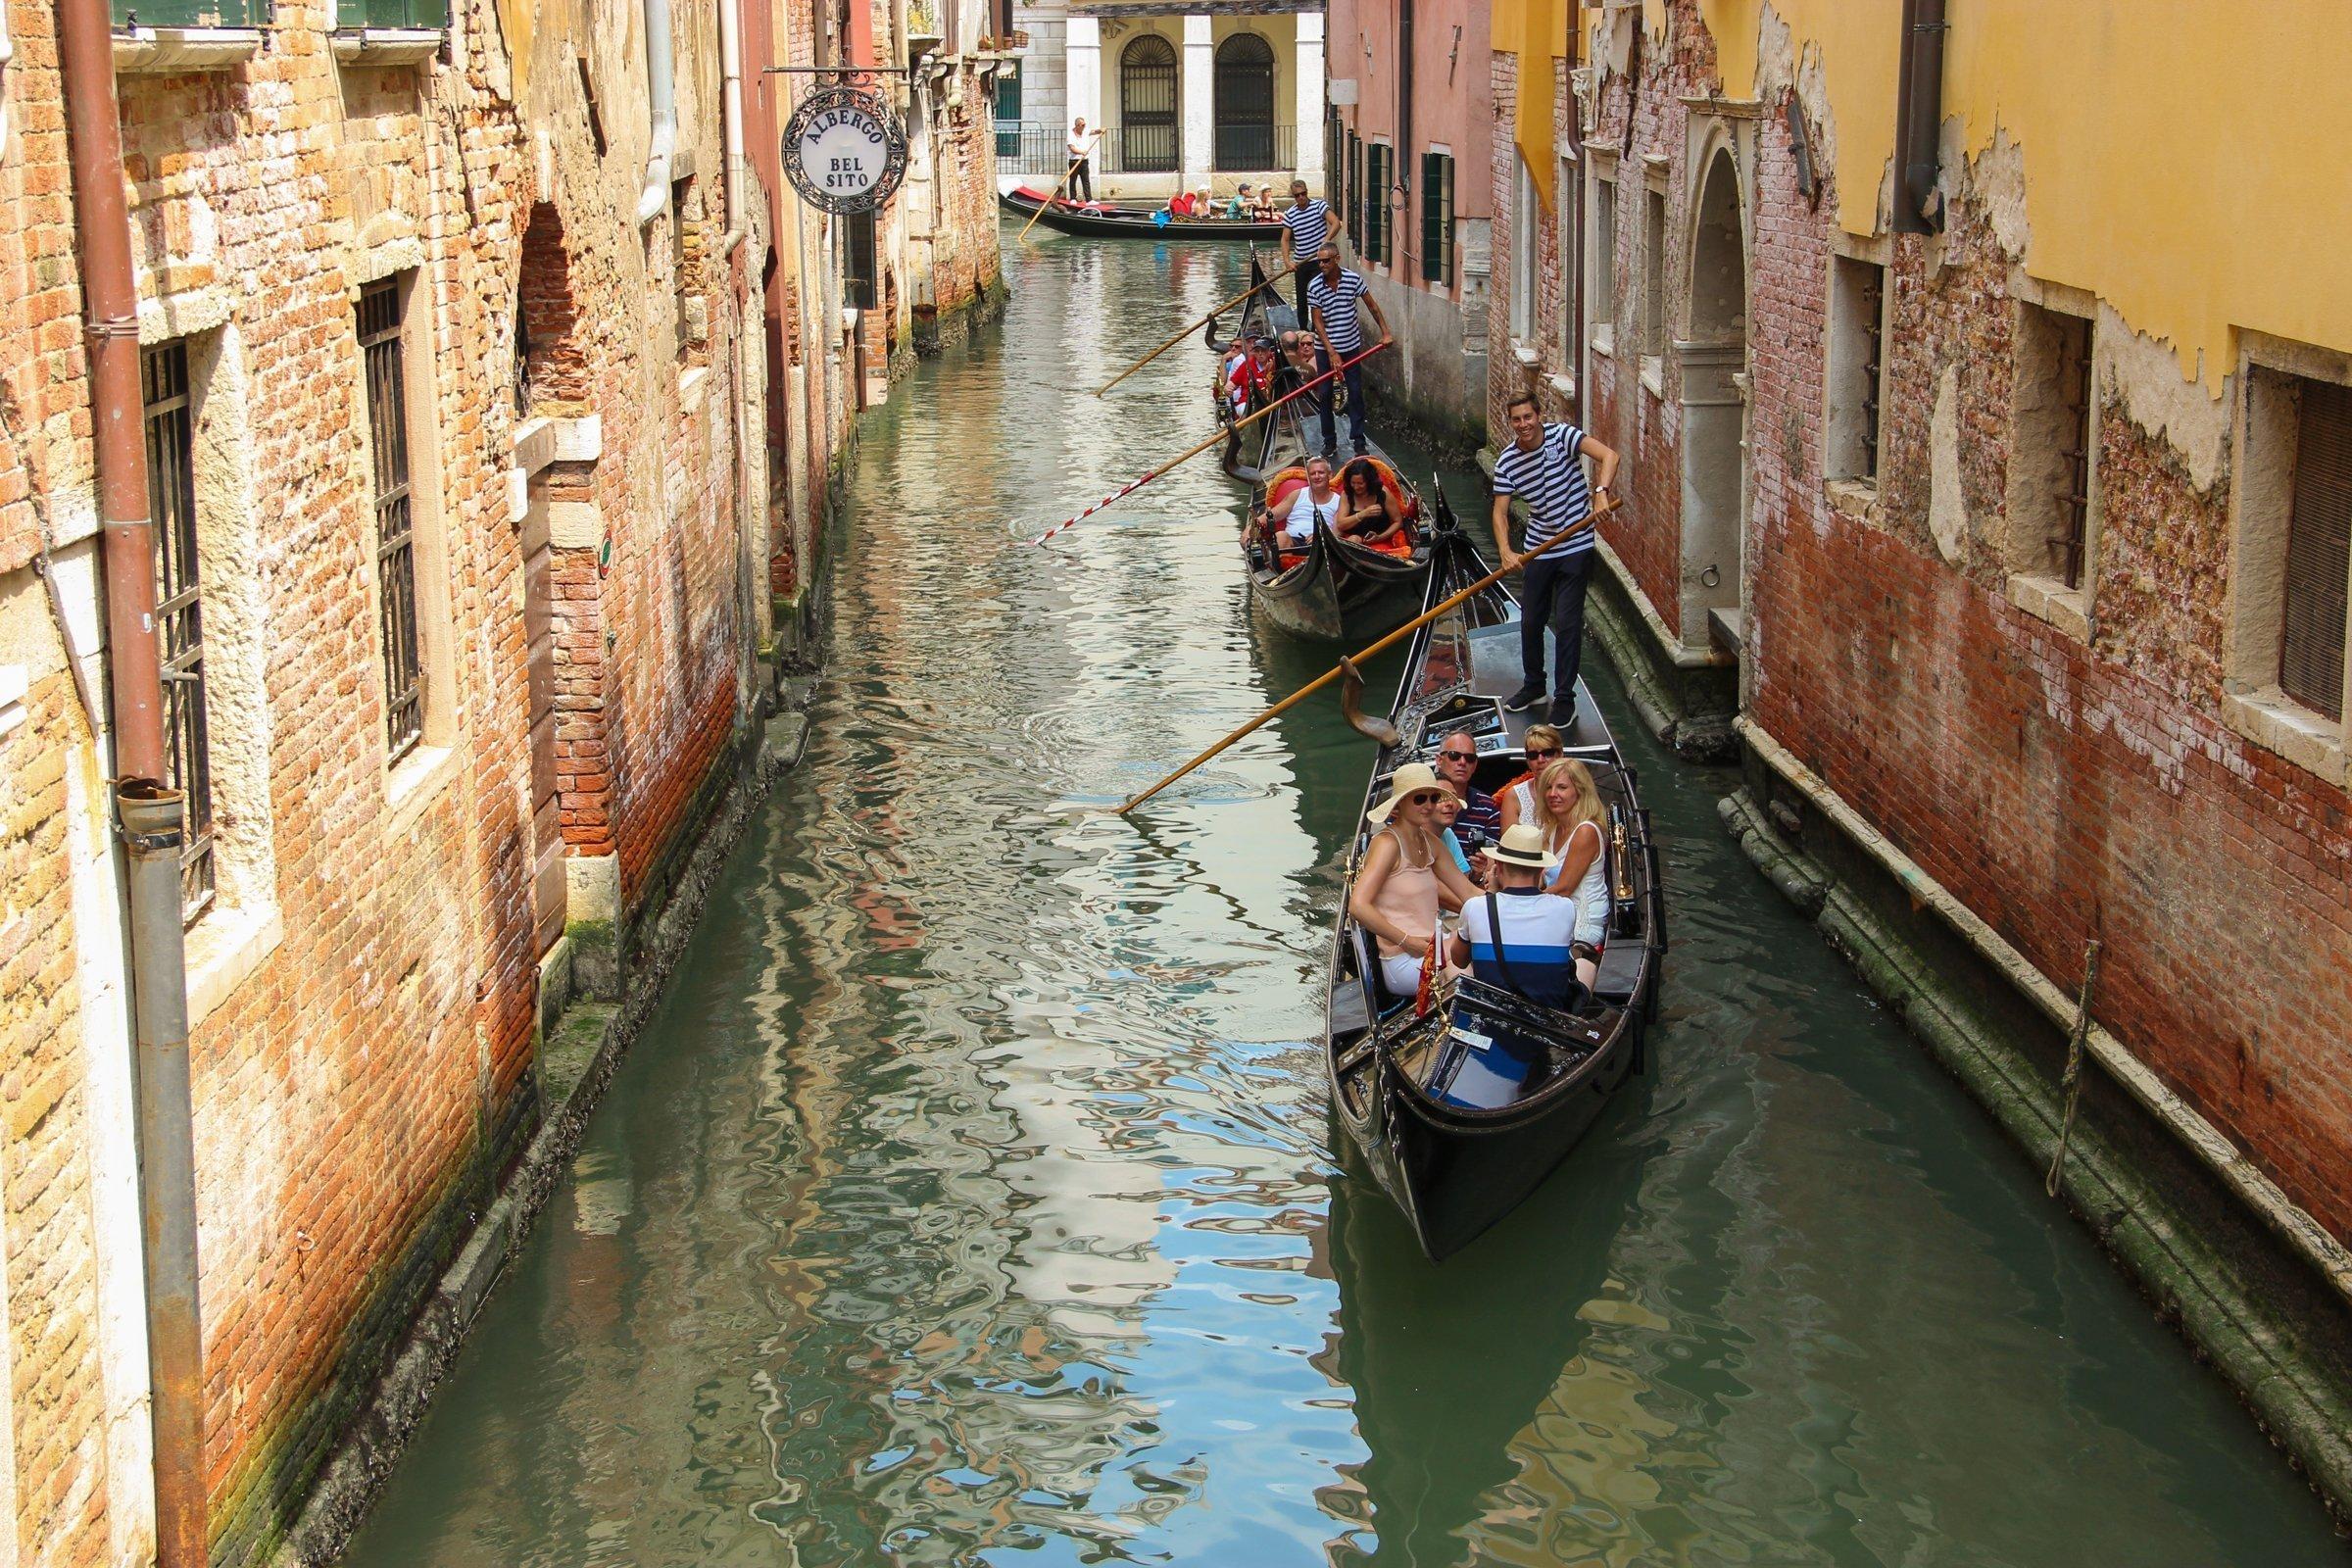 Tourists On Gondolas In Street Between Buildings